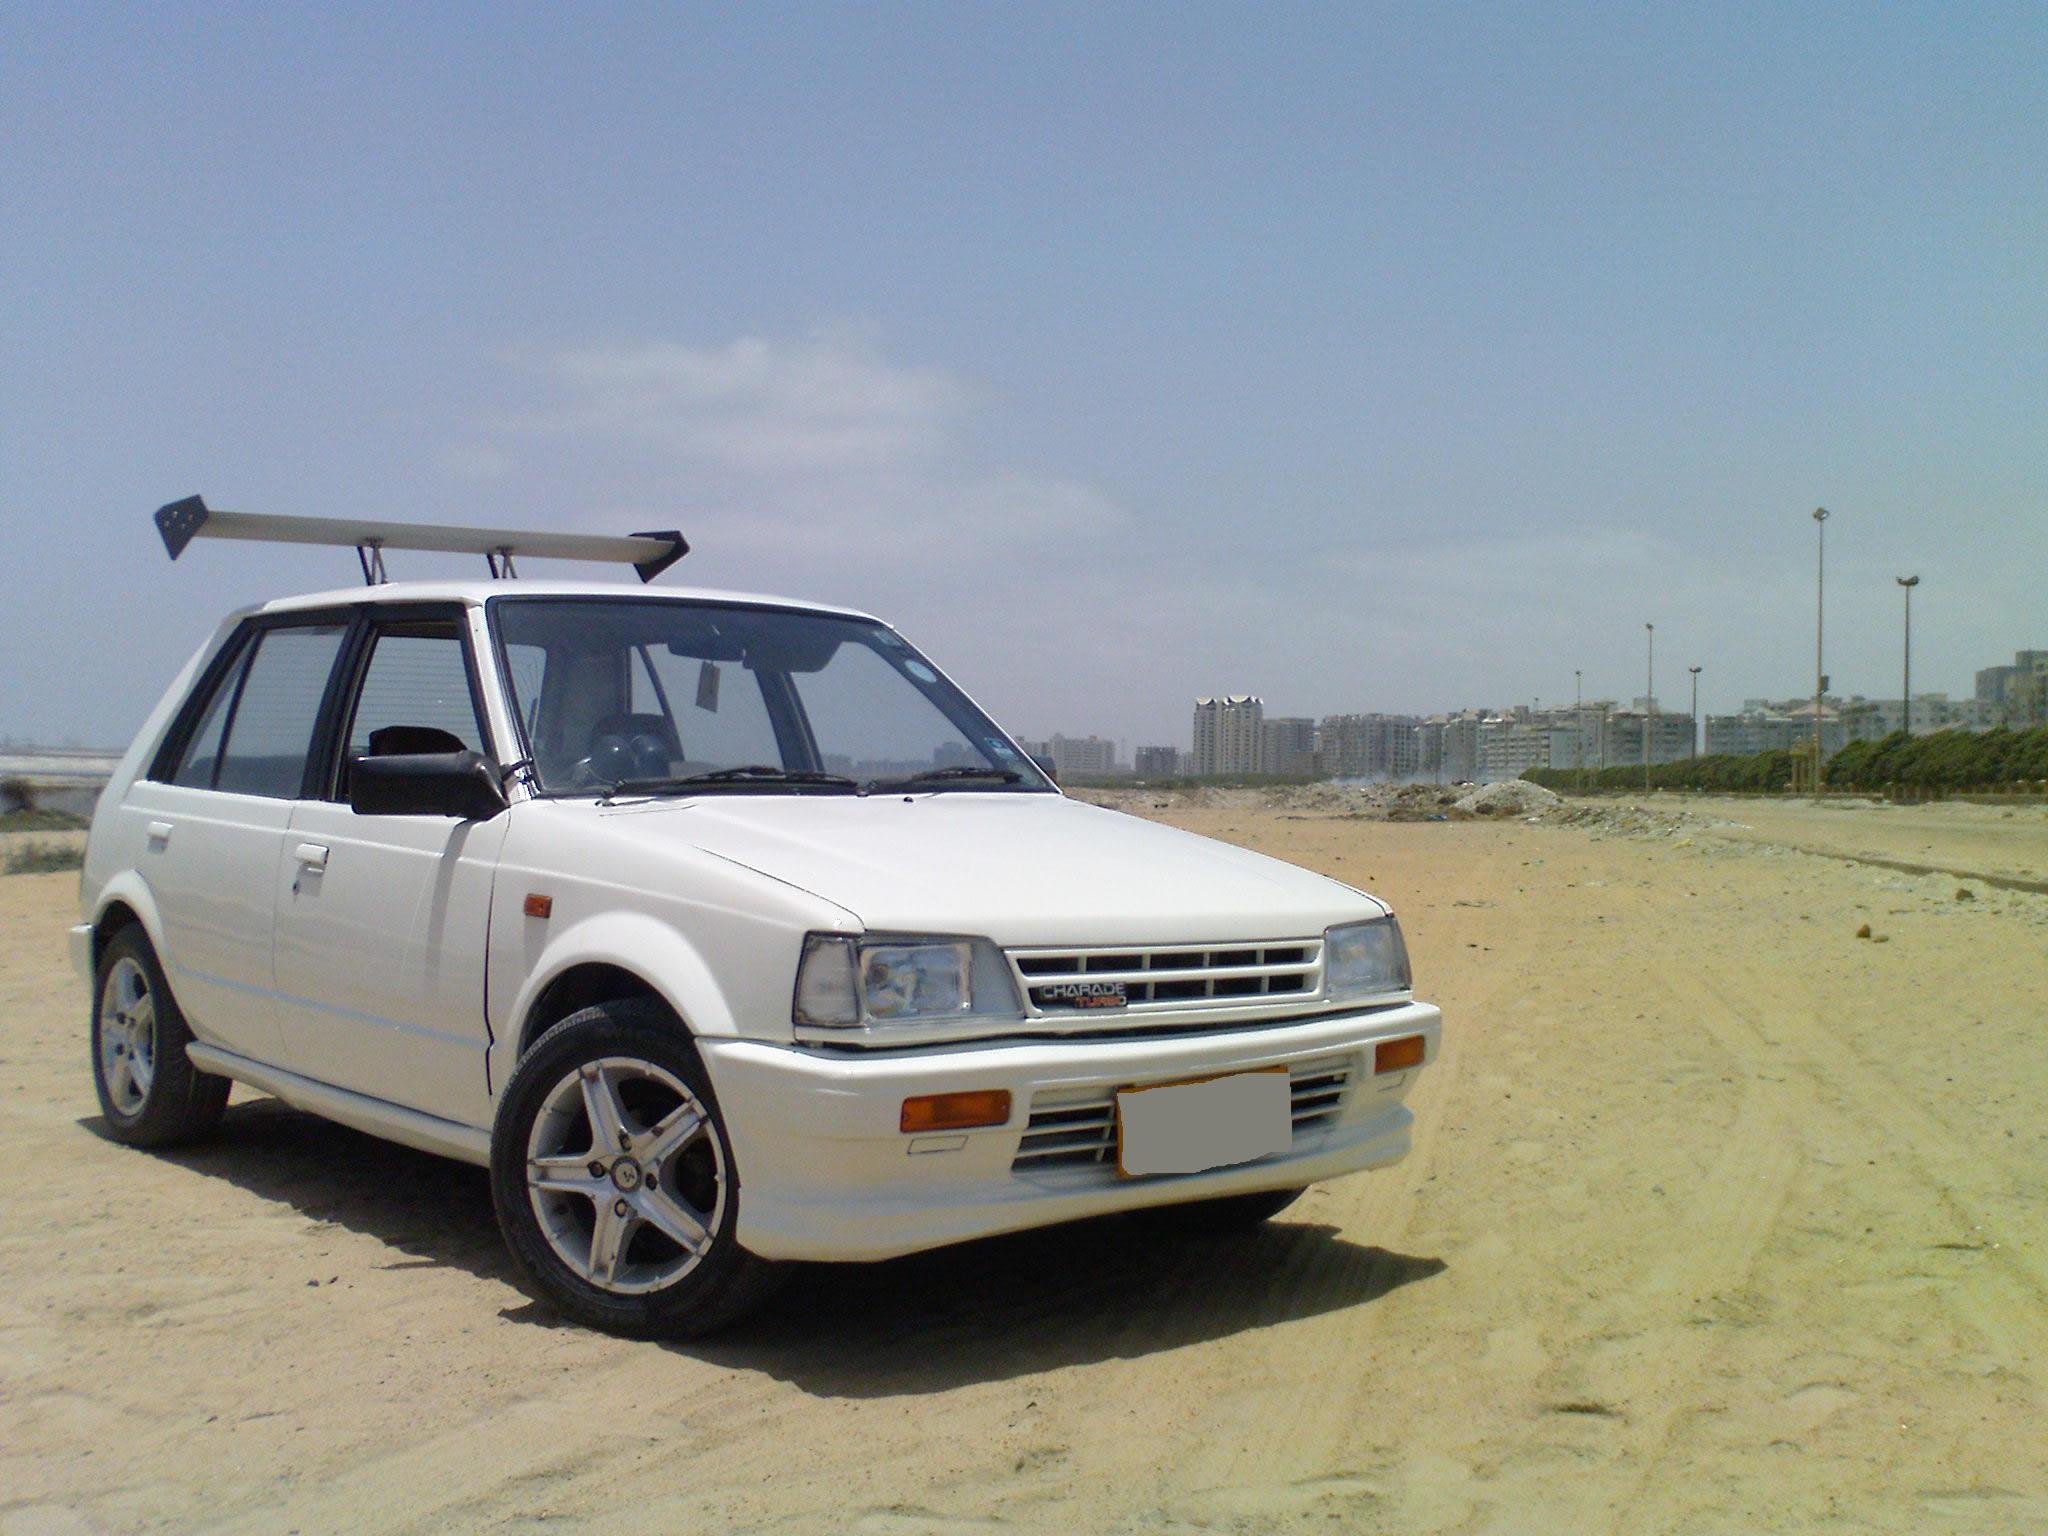 Daihatsu Charade 1986 Of Roadripper Member Ride 16146